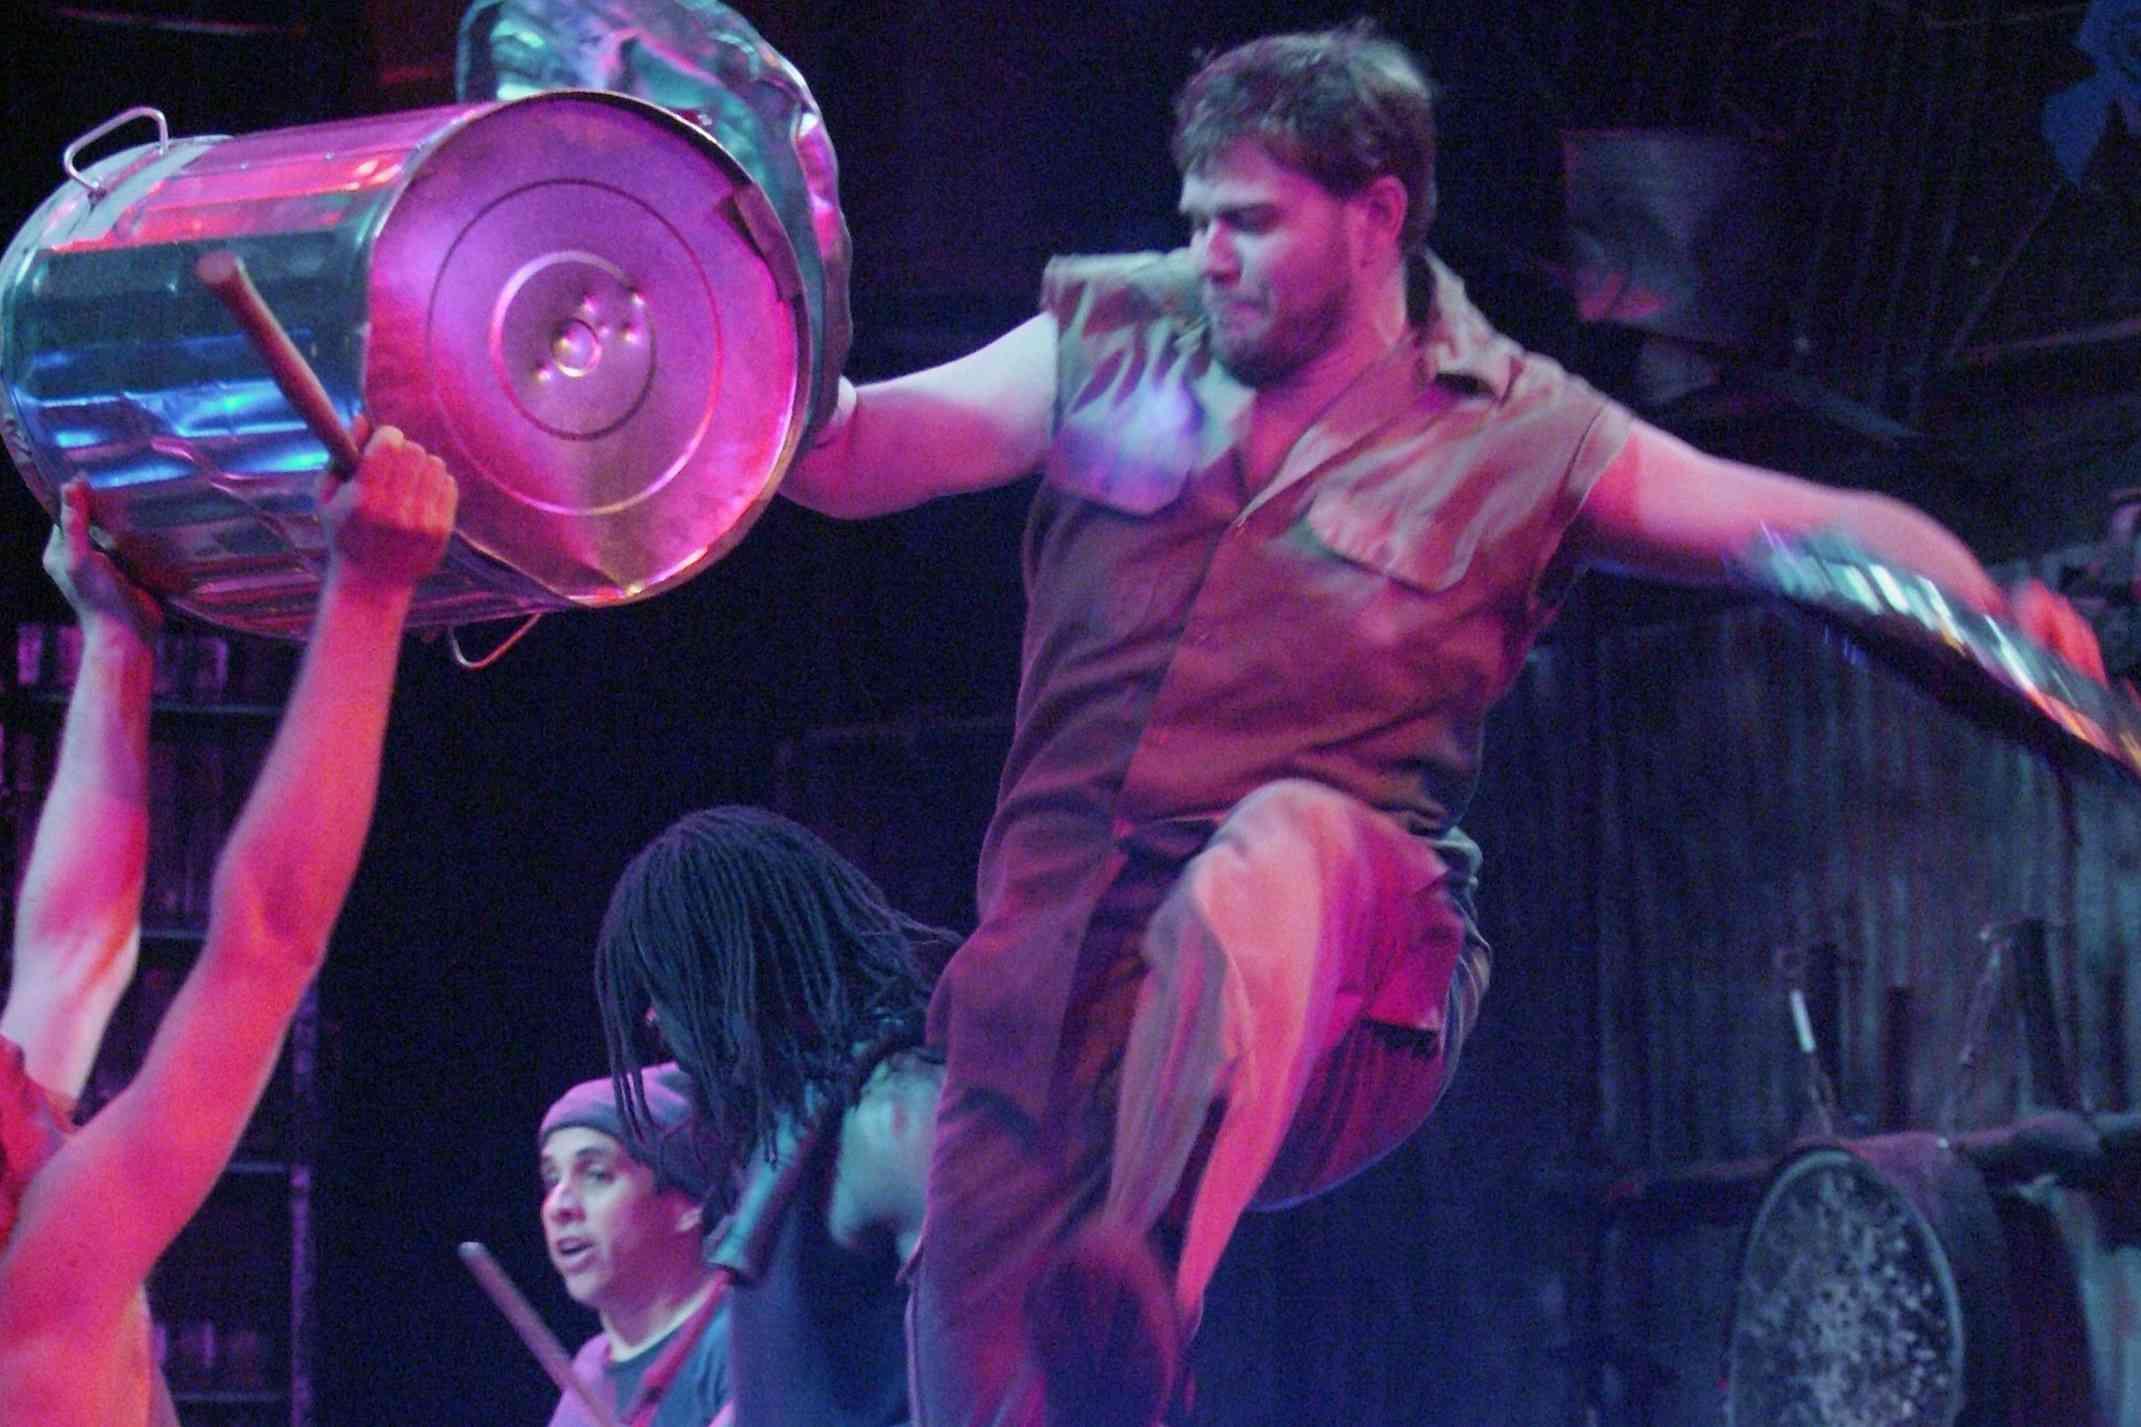 Stomp performance in Detroit